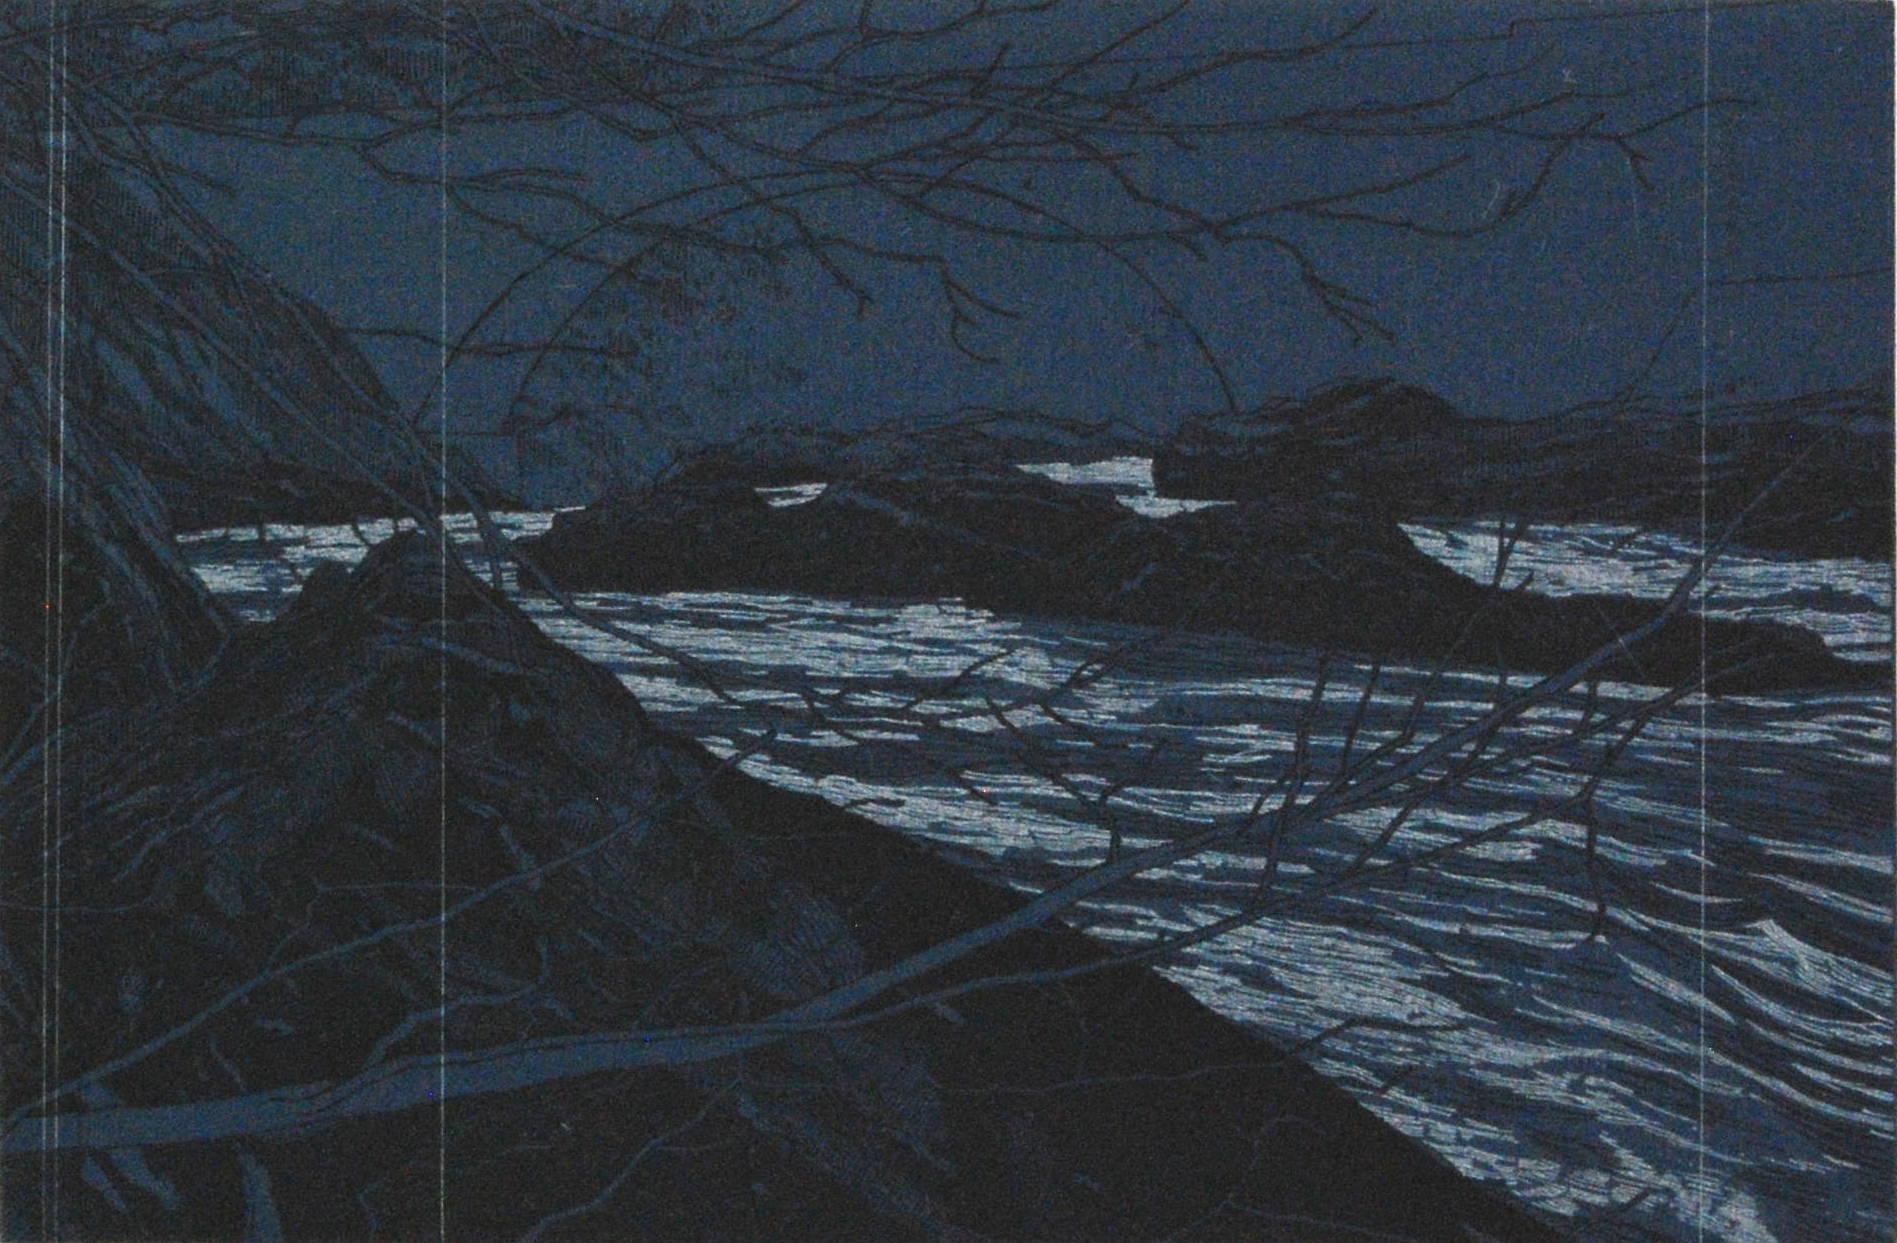 River (Blue), 2017